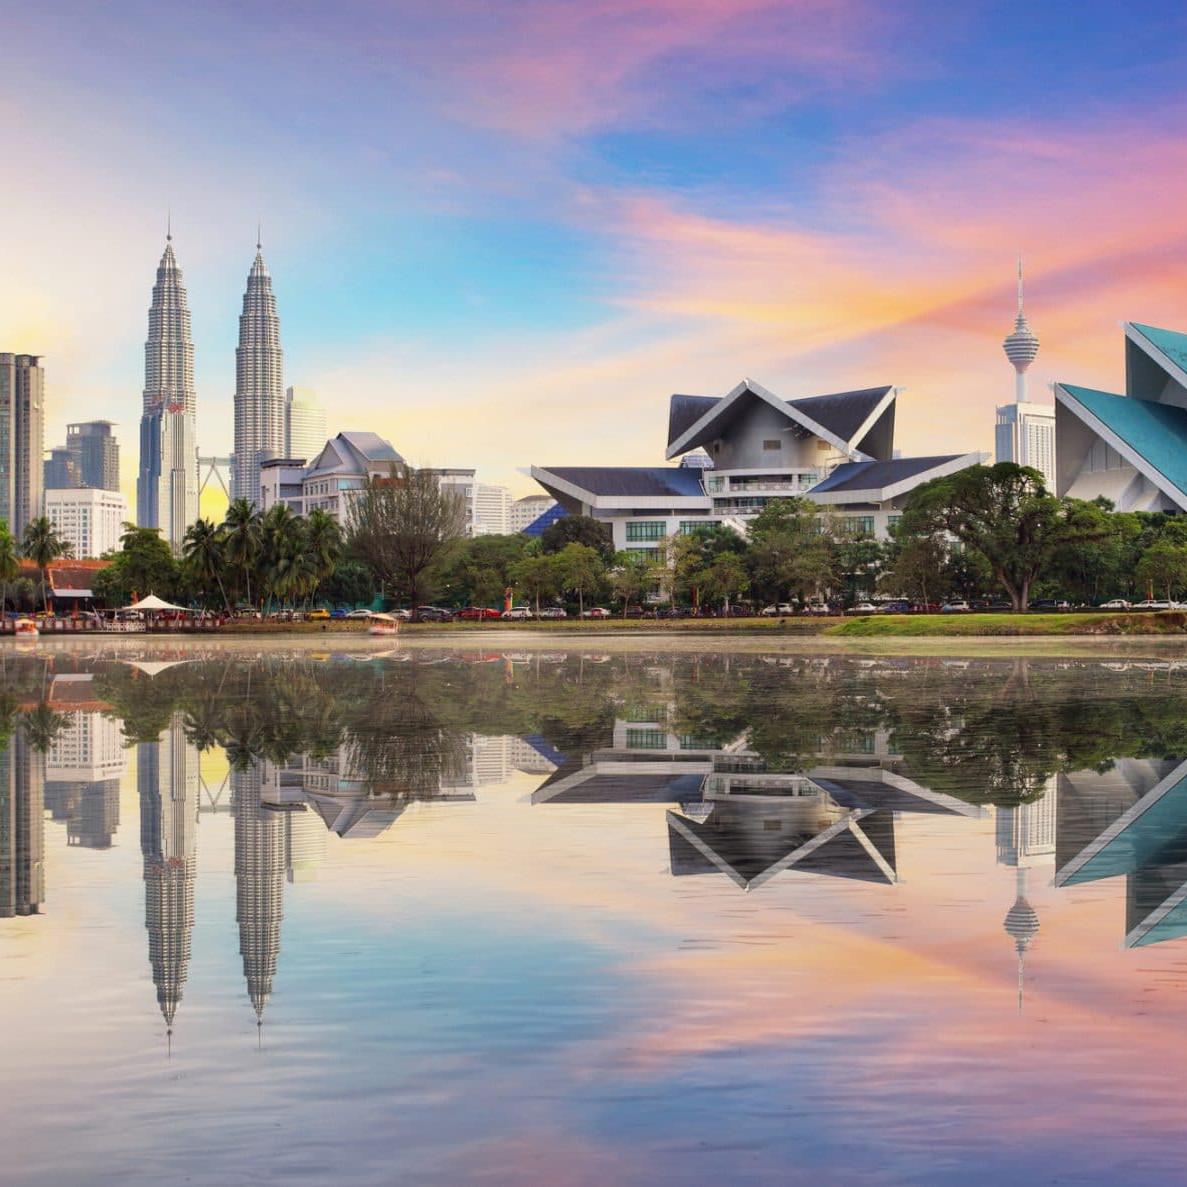 Travel Malaysia landscape